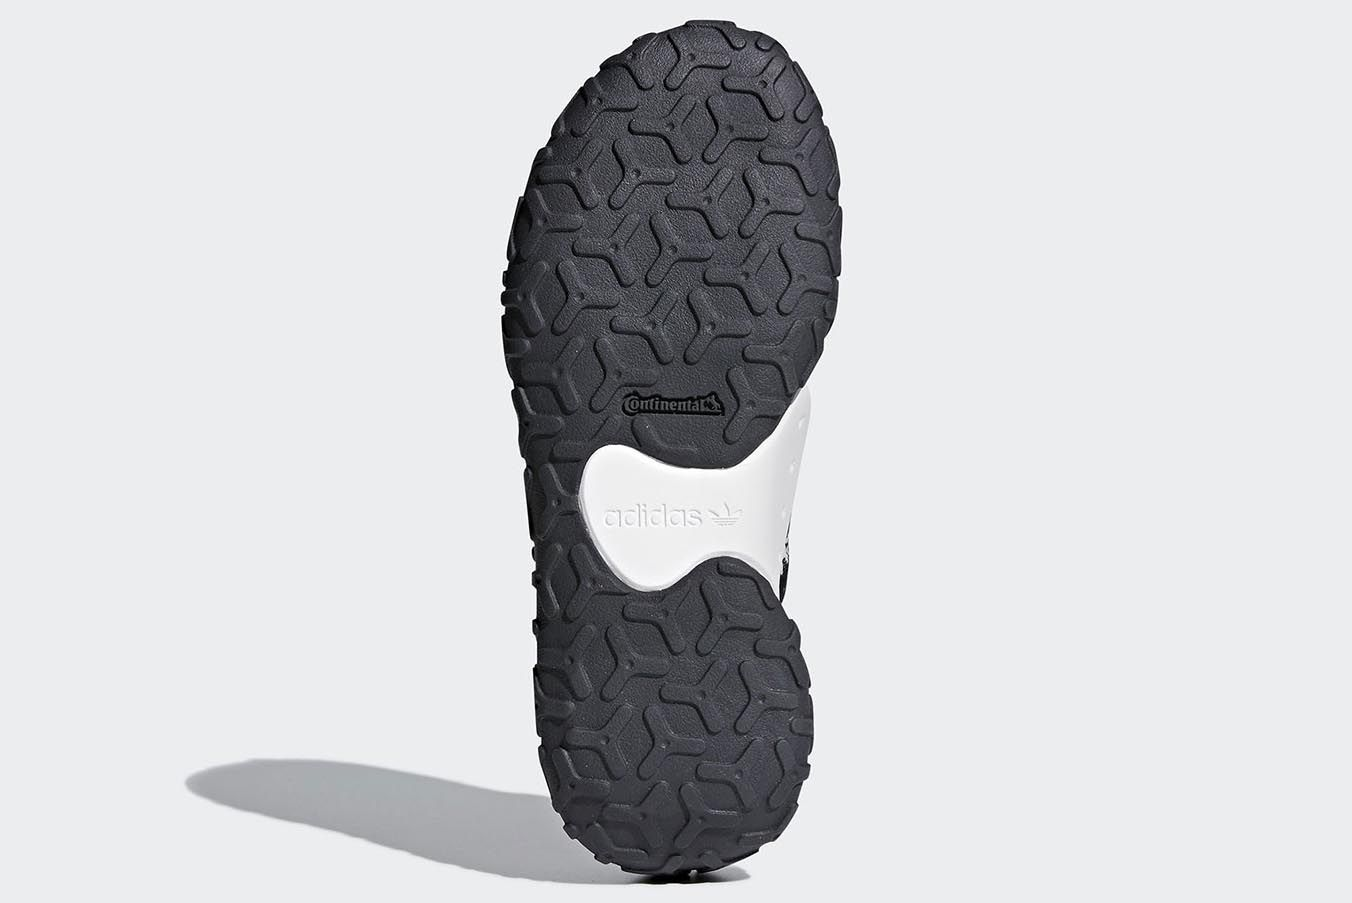 Adidas F22 Primeknit Cq3025 5 Sneaker Freaker